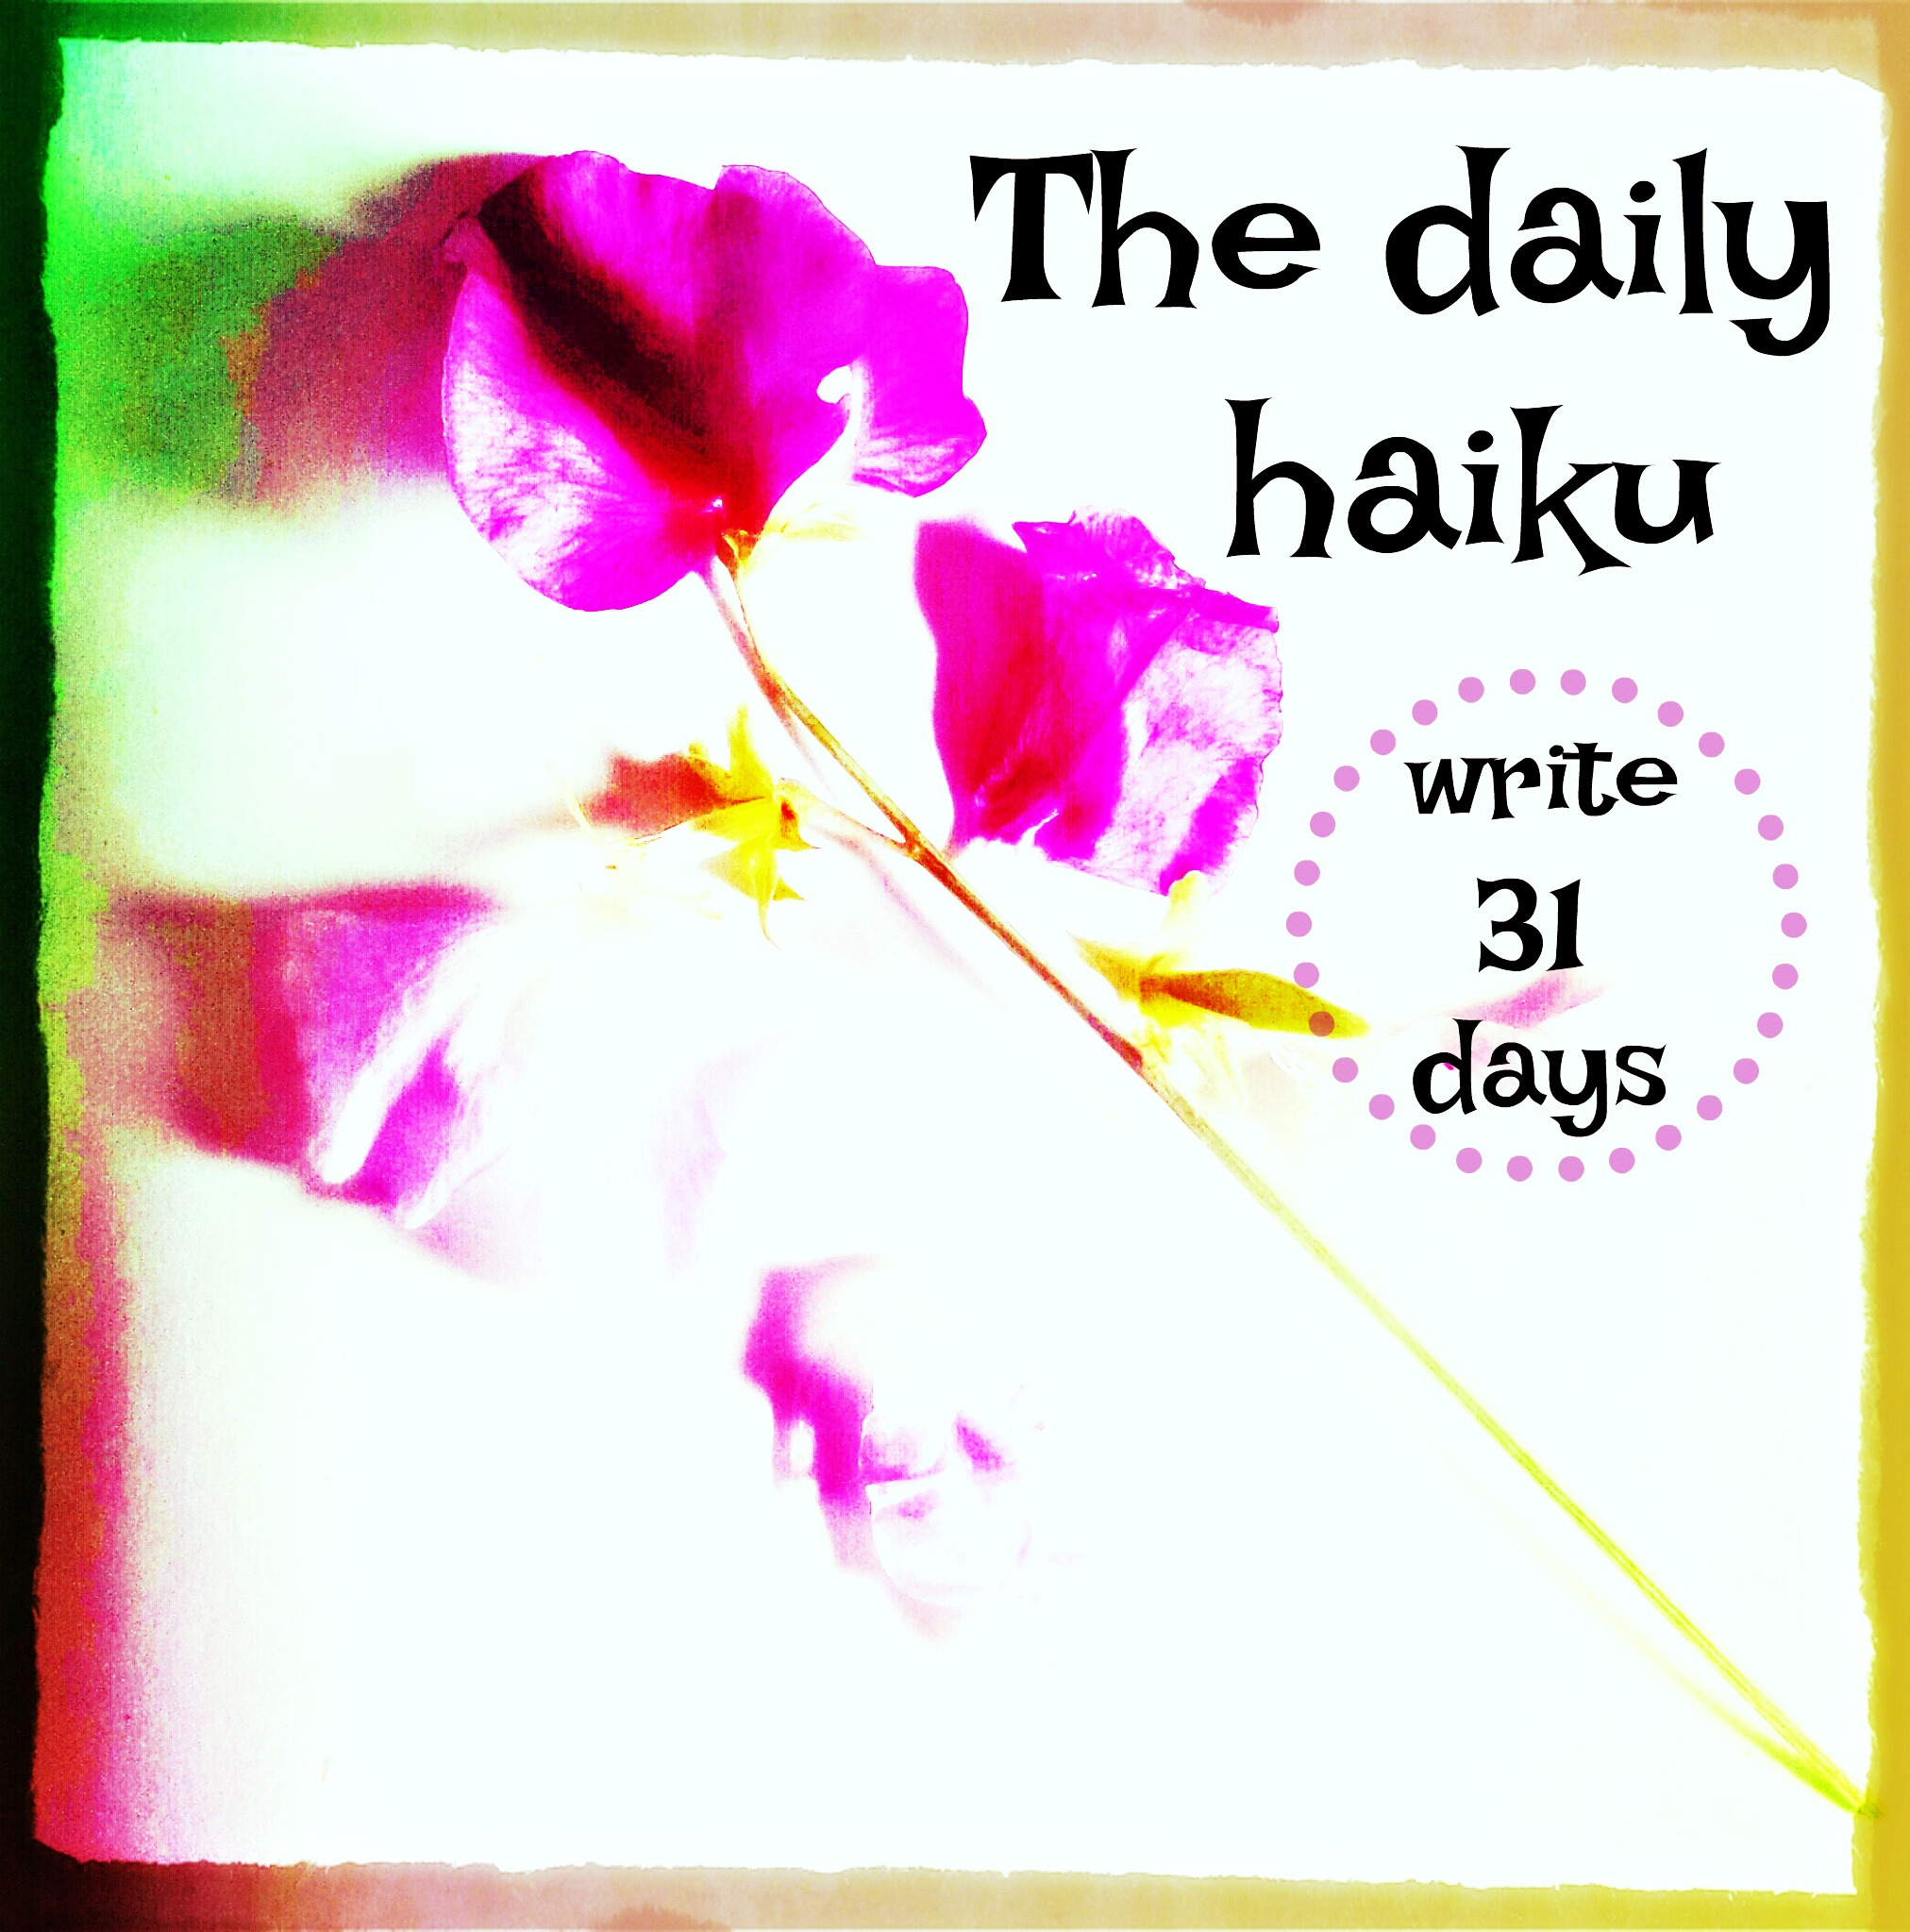 Nuggets Meaning In Urdu: Haiku: Introducing The Daily Haiku